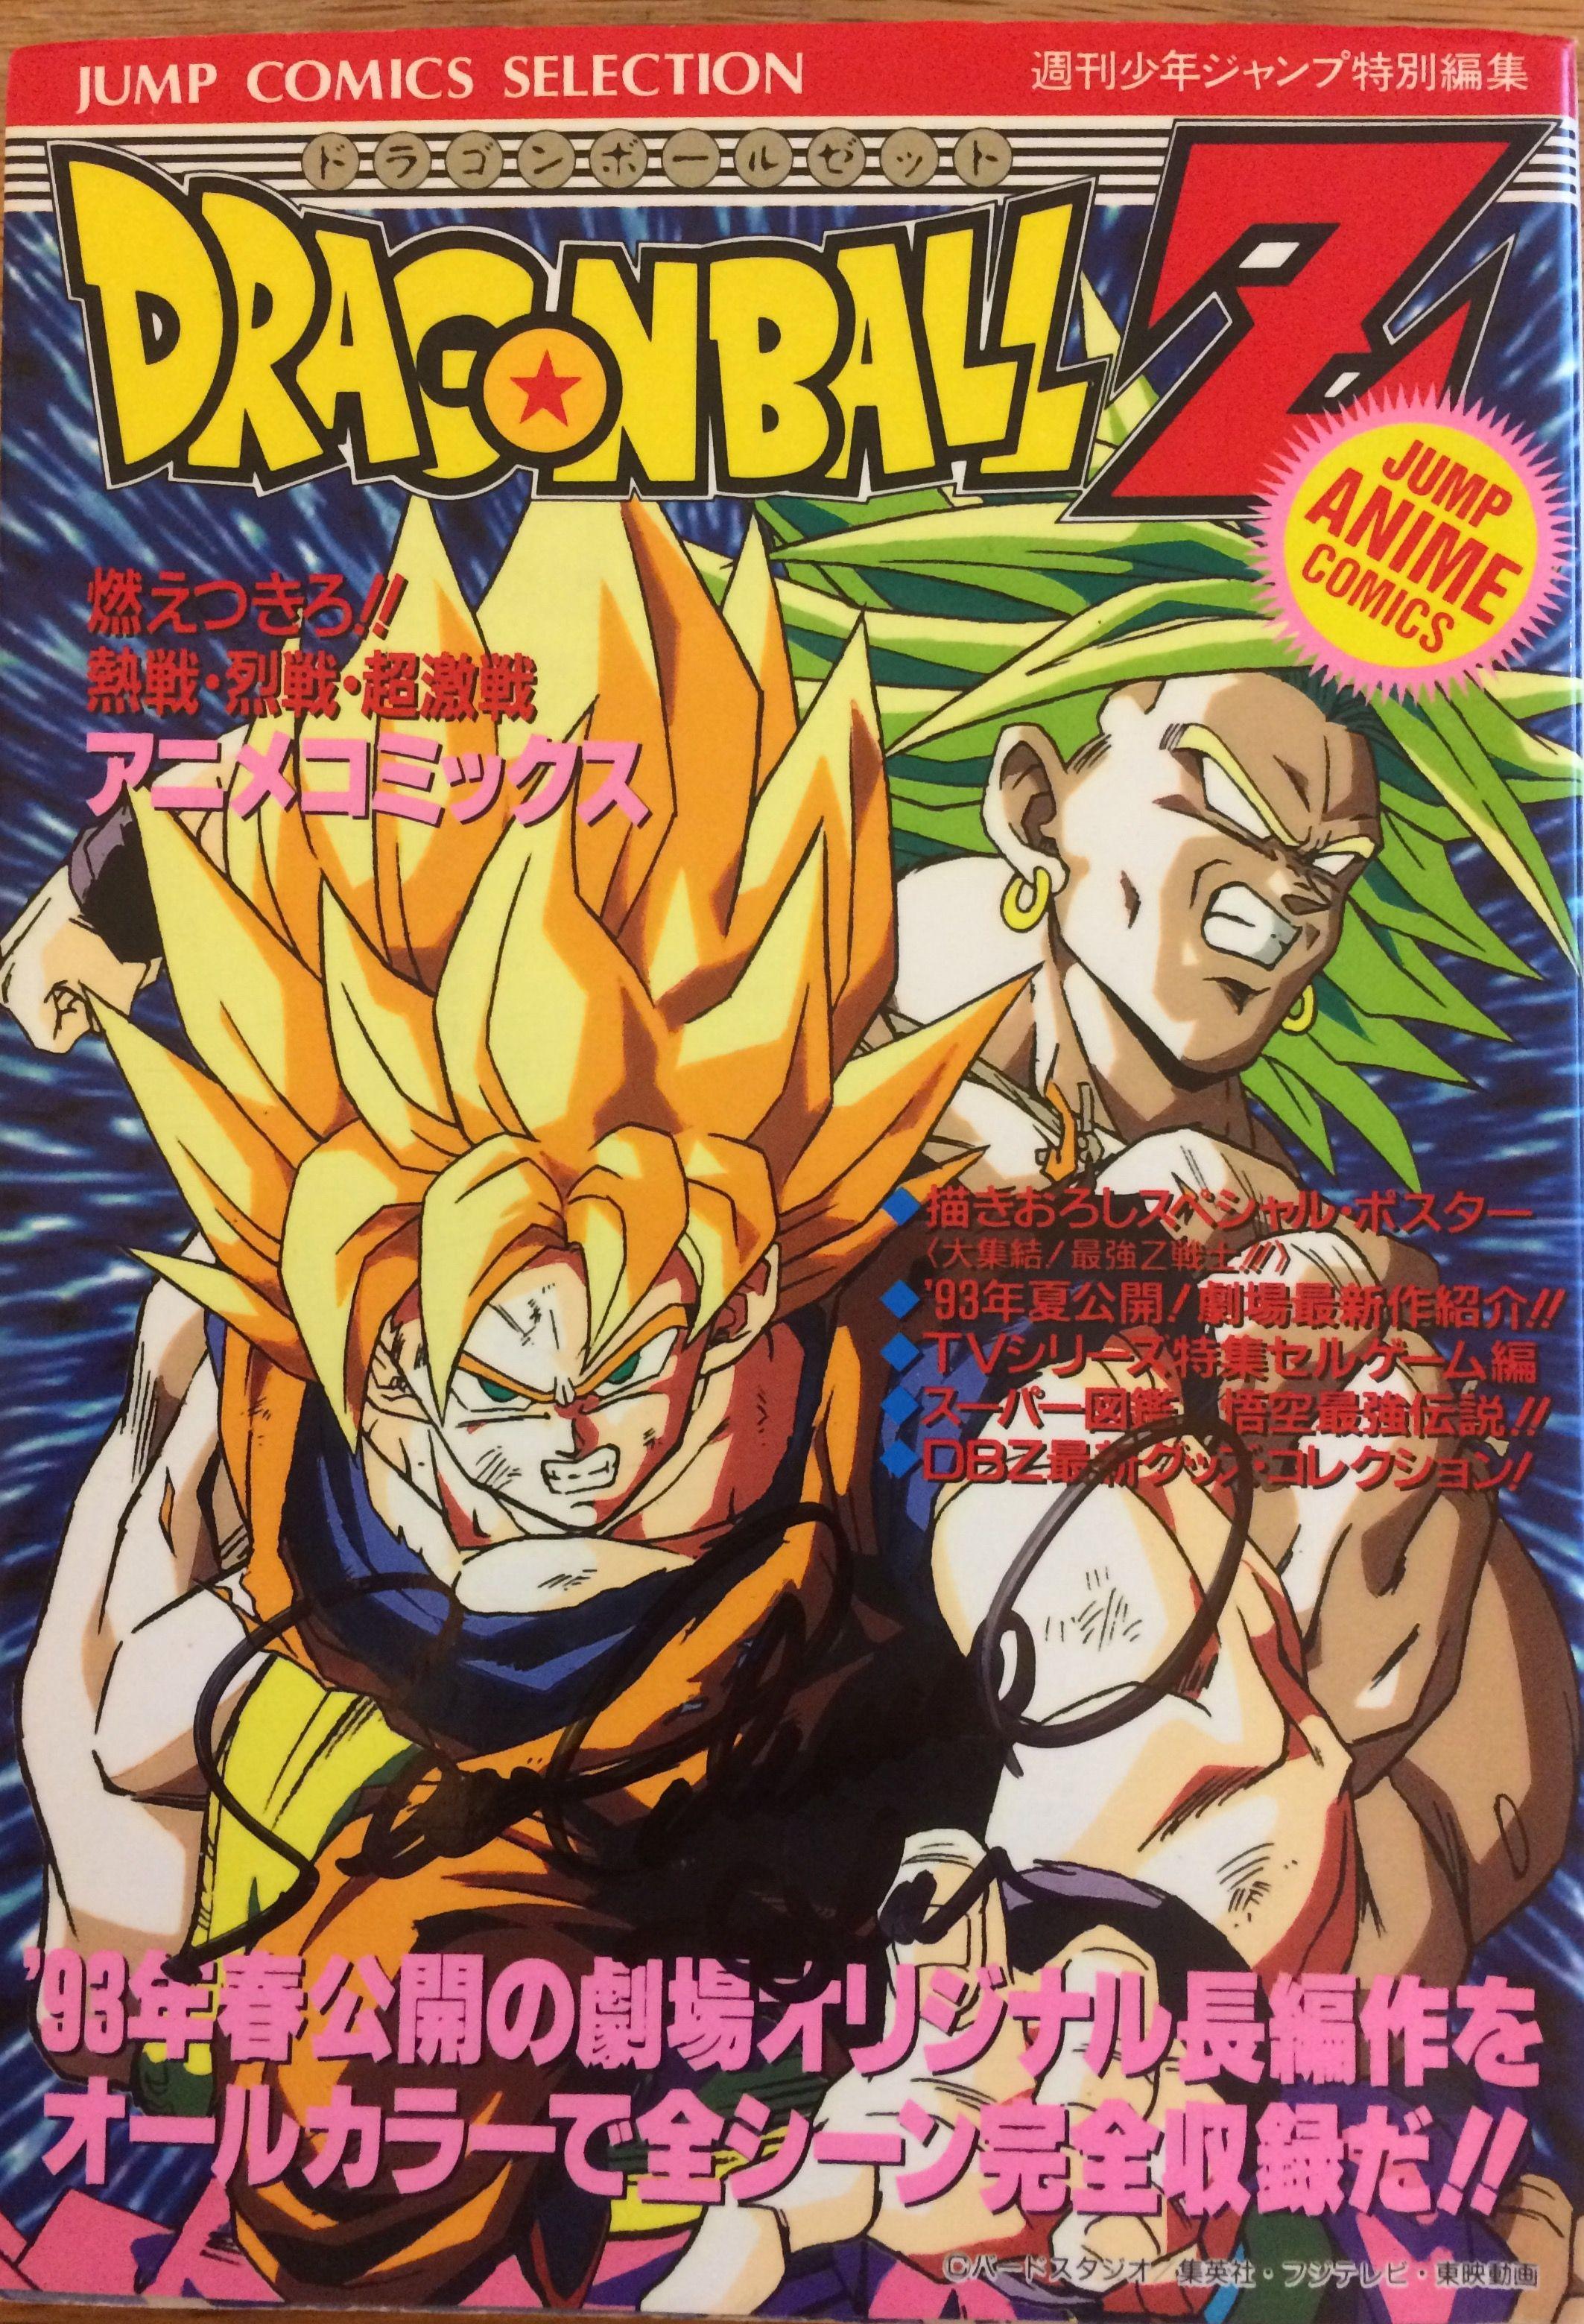 dragon ball super 6  Dragon Ball Z #6: Broly The Legendary Super Saiyan by Jump Comics ...